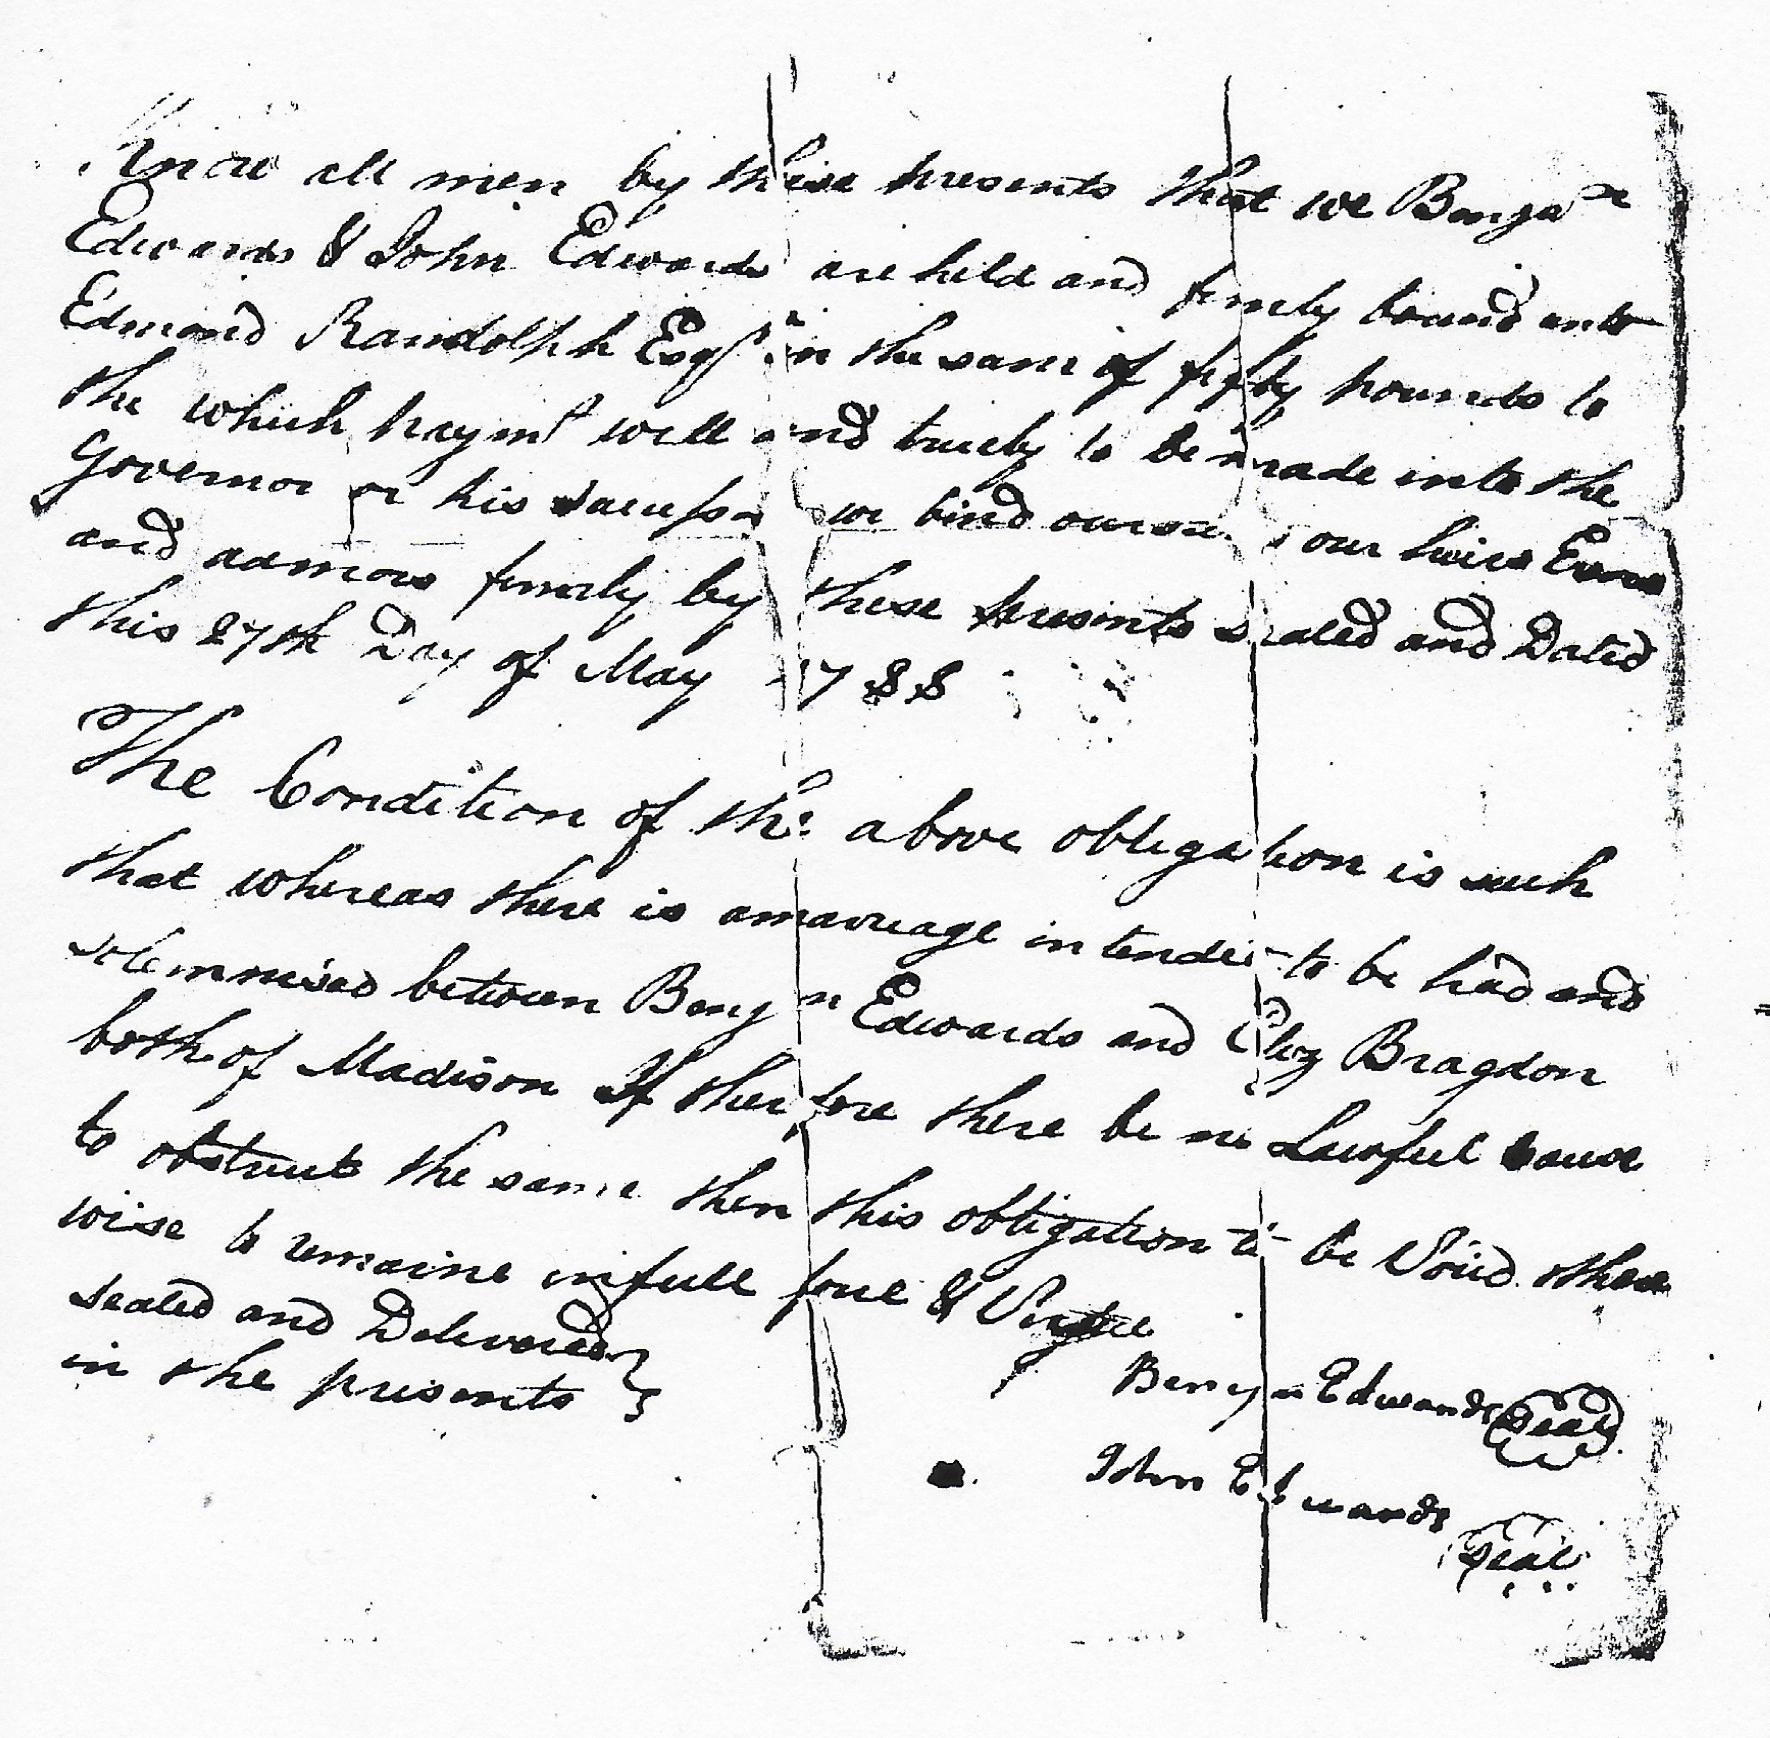 Benjamin Edwards And Elizabeth Bragdon 1788 Marriage Bond